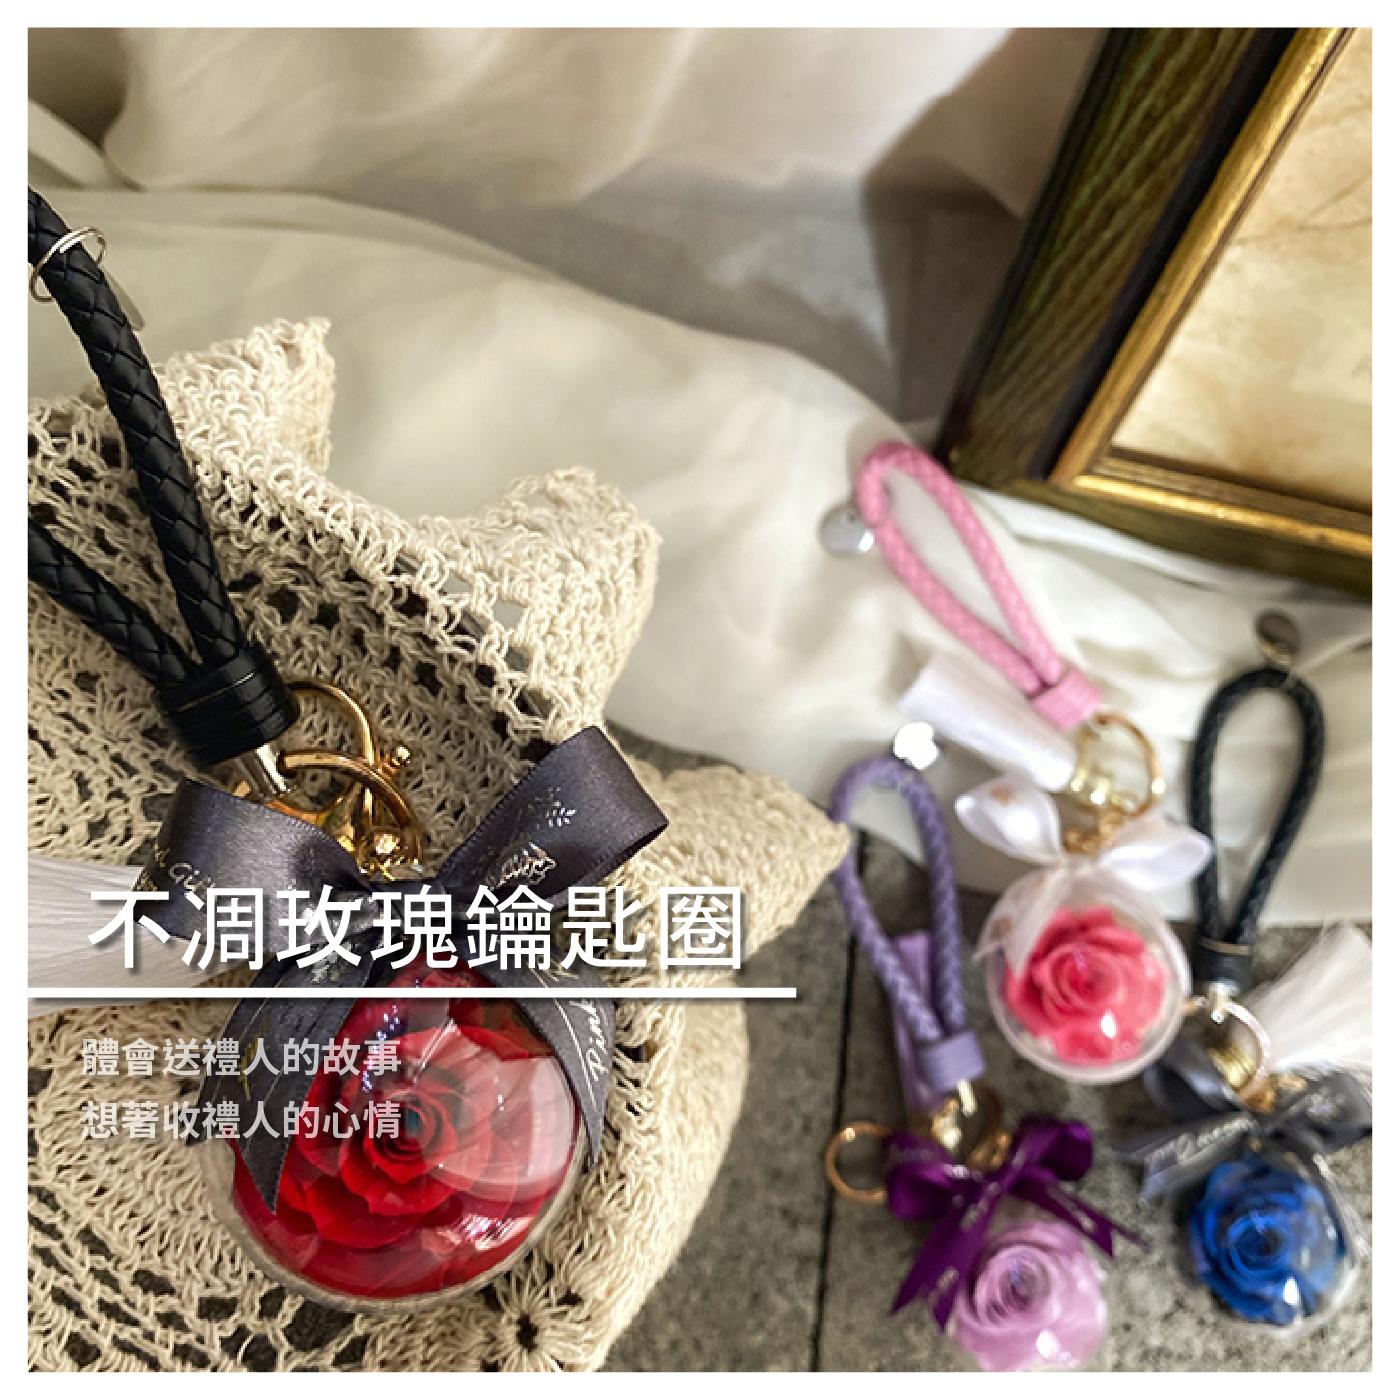 【Pink Rabbit Garden】『PRG永生花/乾燥花』不凋玫瑰鑰匙圈 / 花草 / 園藝